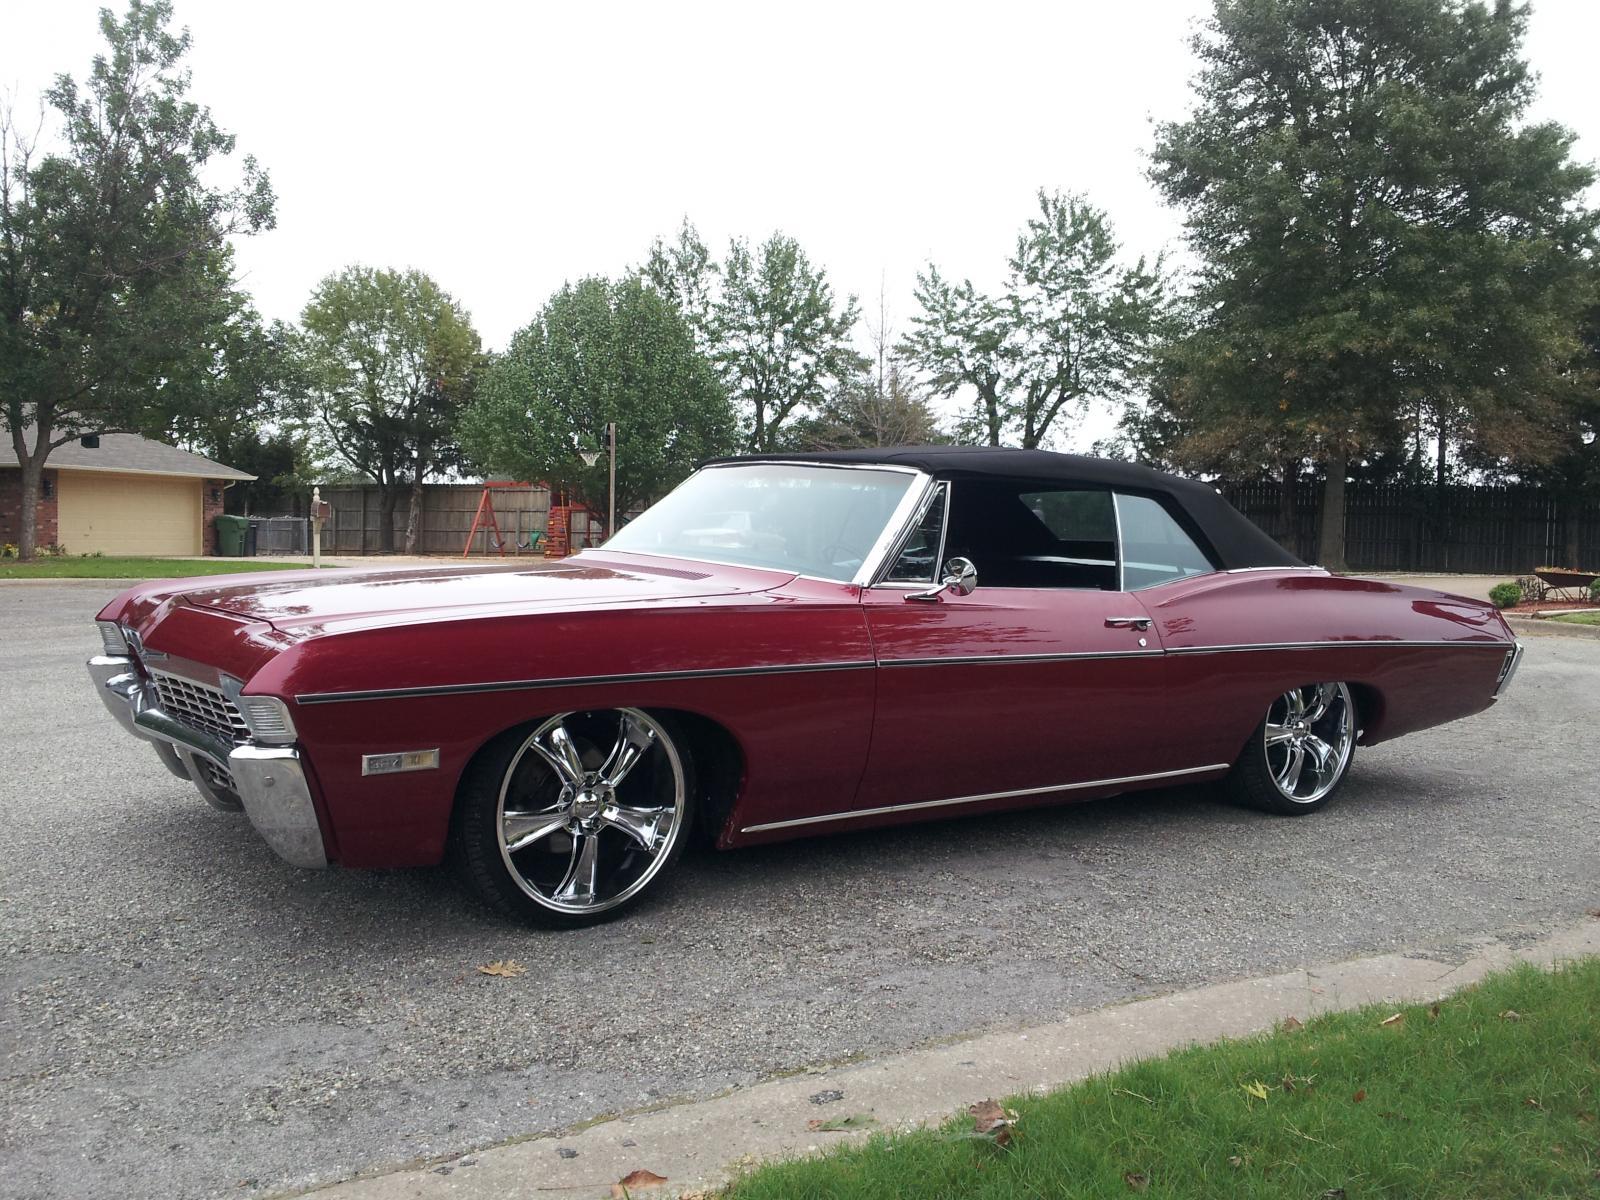 1969 Impala Wagon1966 Chevrolet Caprice 2 Door Hardtop 102693 1968 1966 68 Slammed